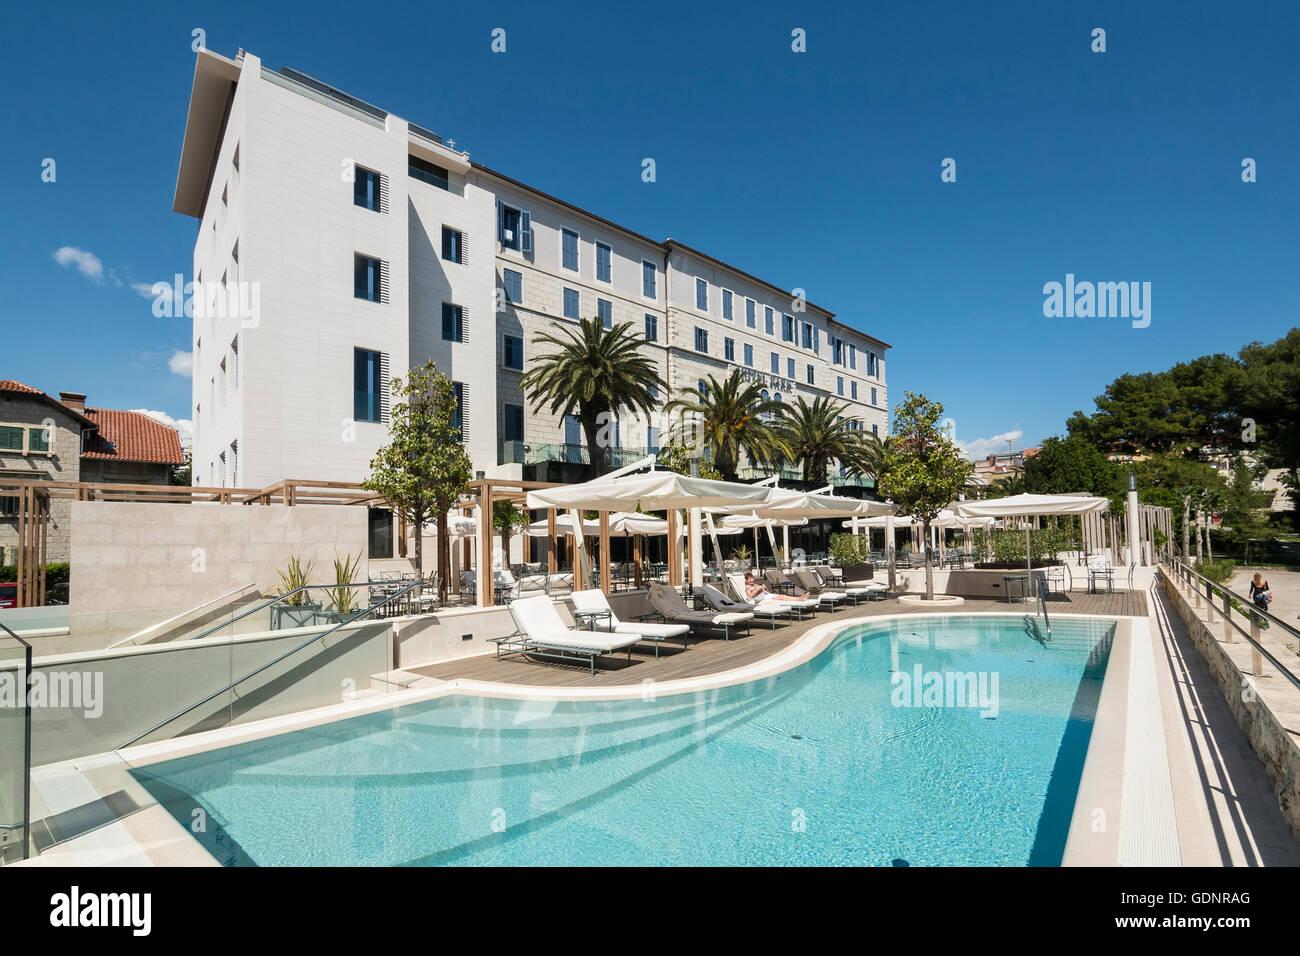 Hotel Park, Hatzeov perivoj 3, 21000 Split, Hrvatska Split, Croatia, Dalmatian Coast - Stock Image